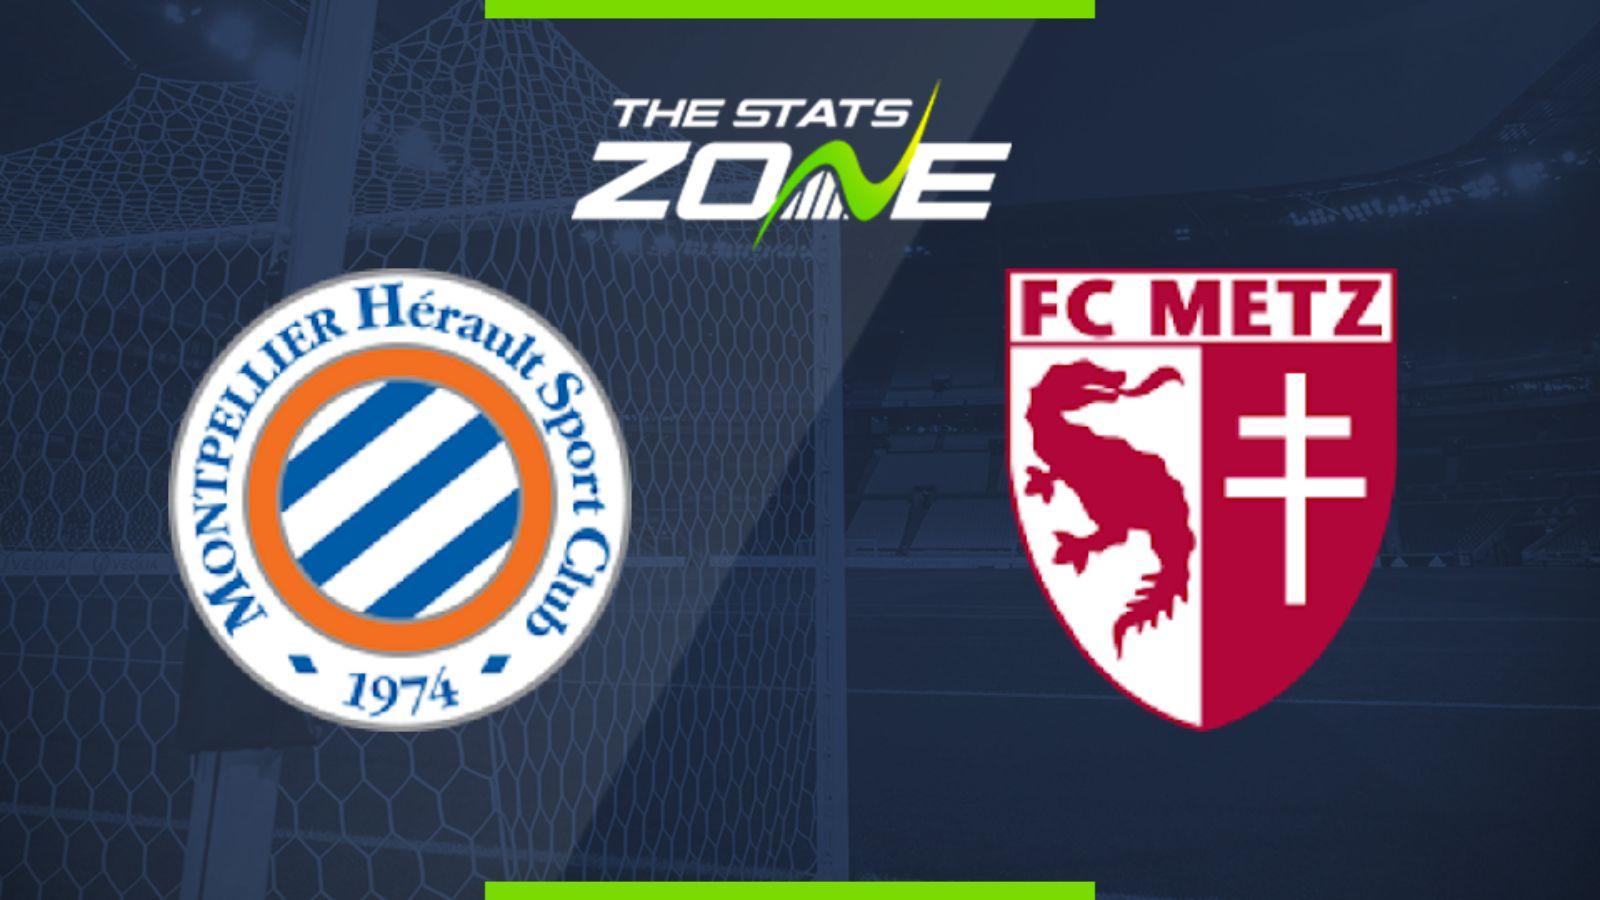 Breaking Latest Soccer News Around The World Espsoccer In 2020 Soccer News News Around The World Metz